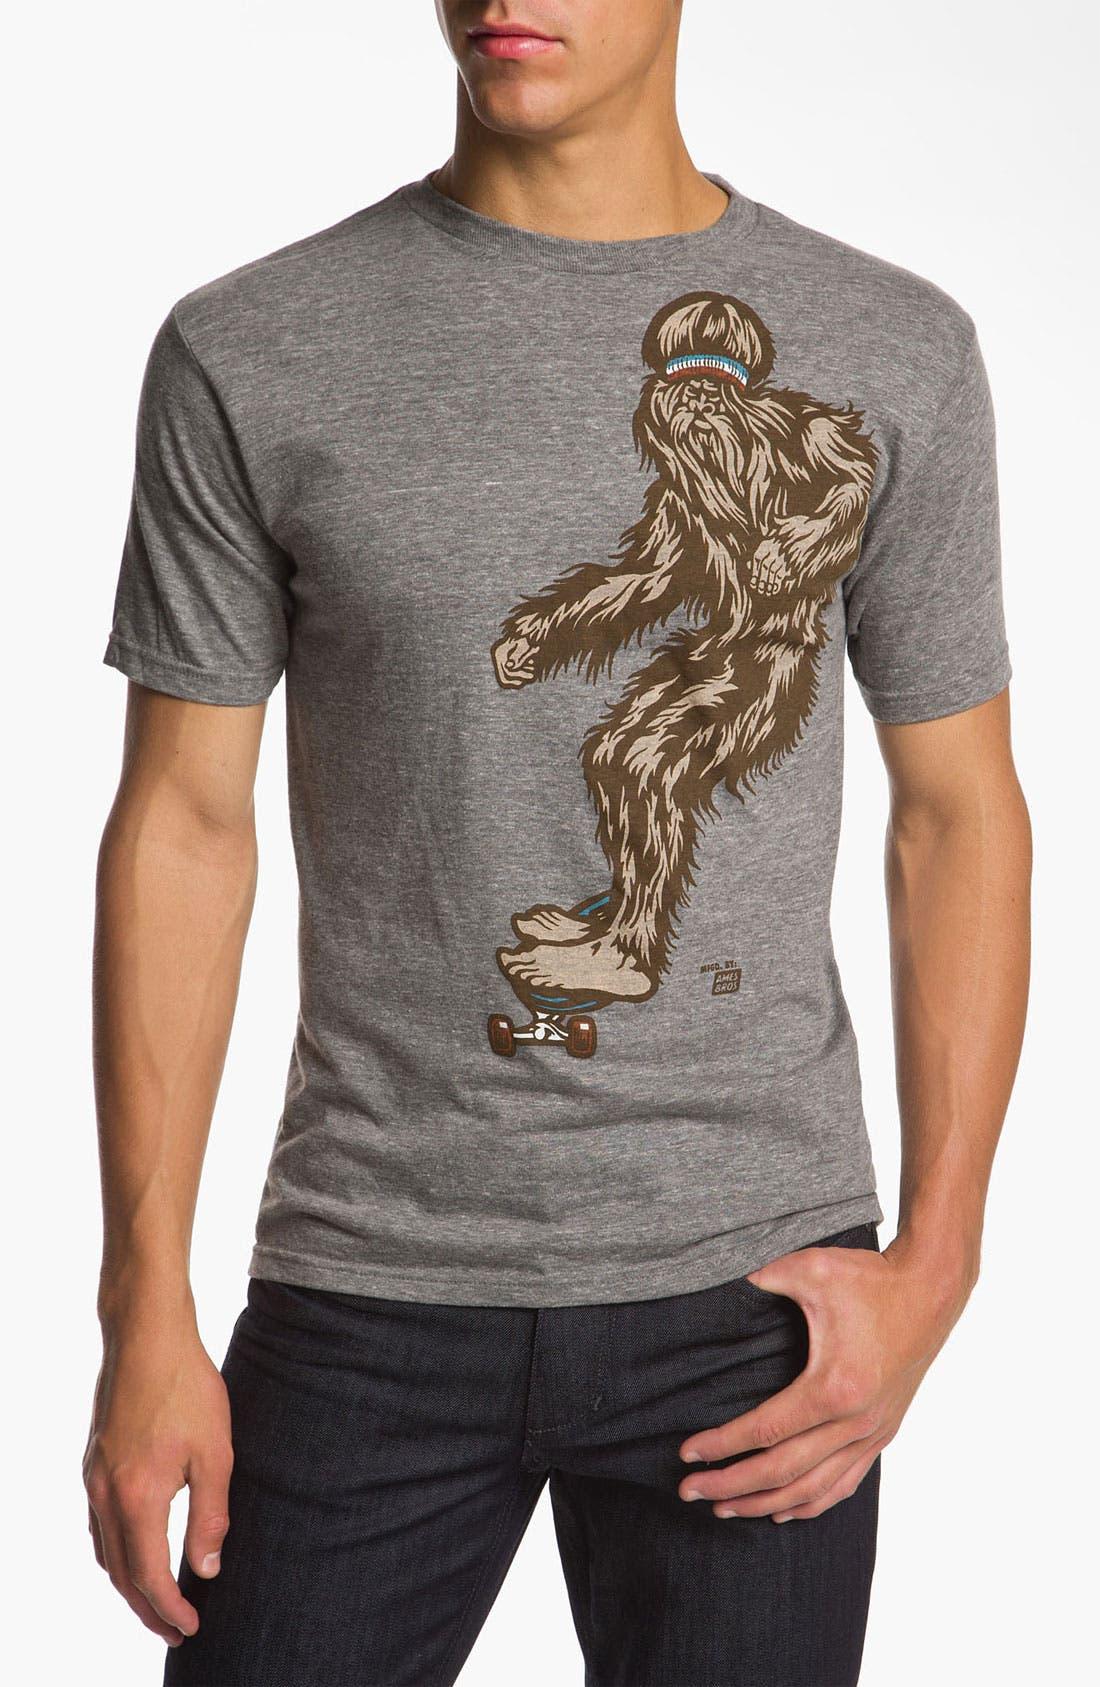 Alternate Image 1 Selected - Ames Bros 'Bjorn to Skate' Trim Fit Crewneck T-Shirt (Men)